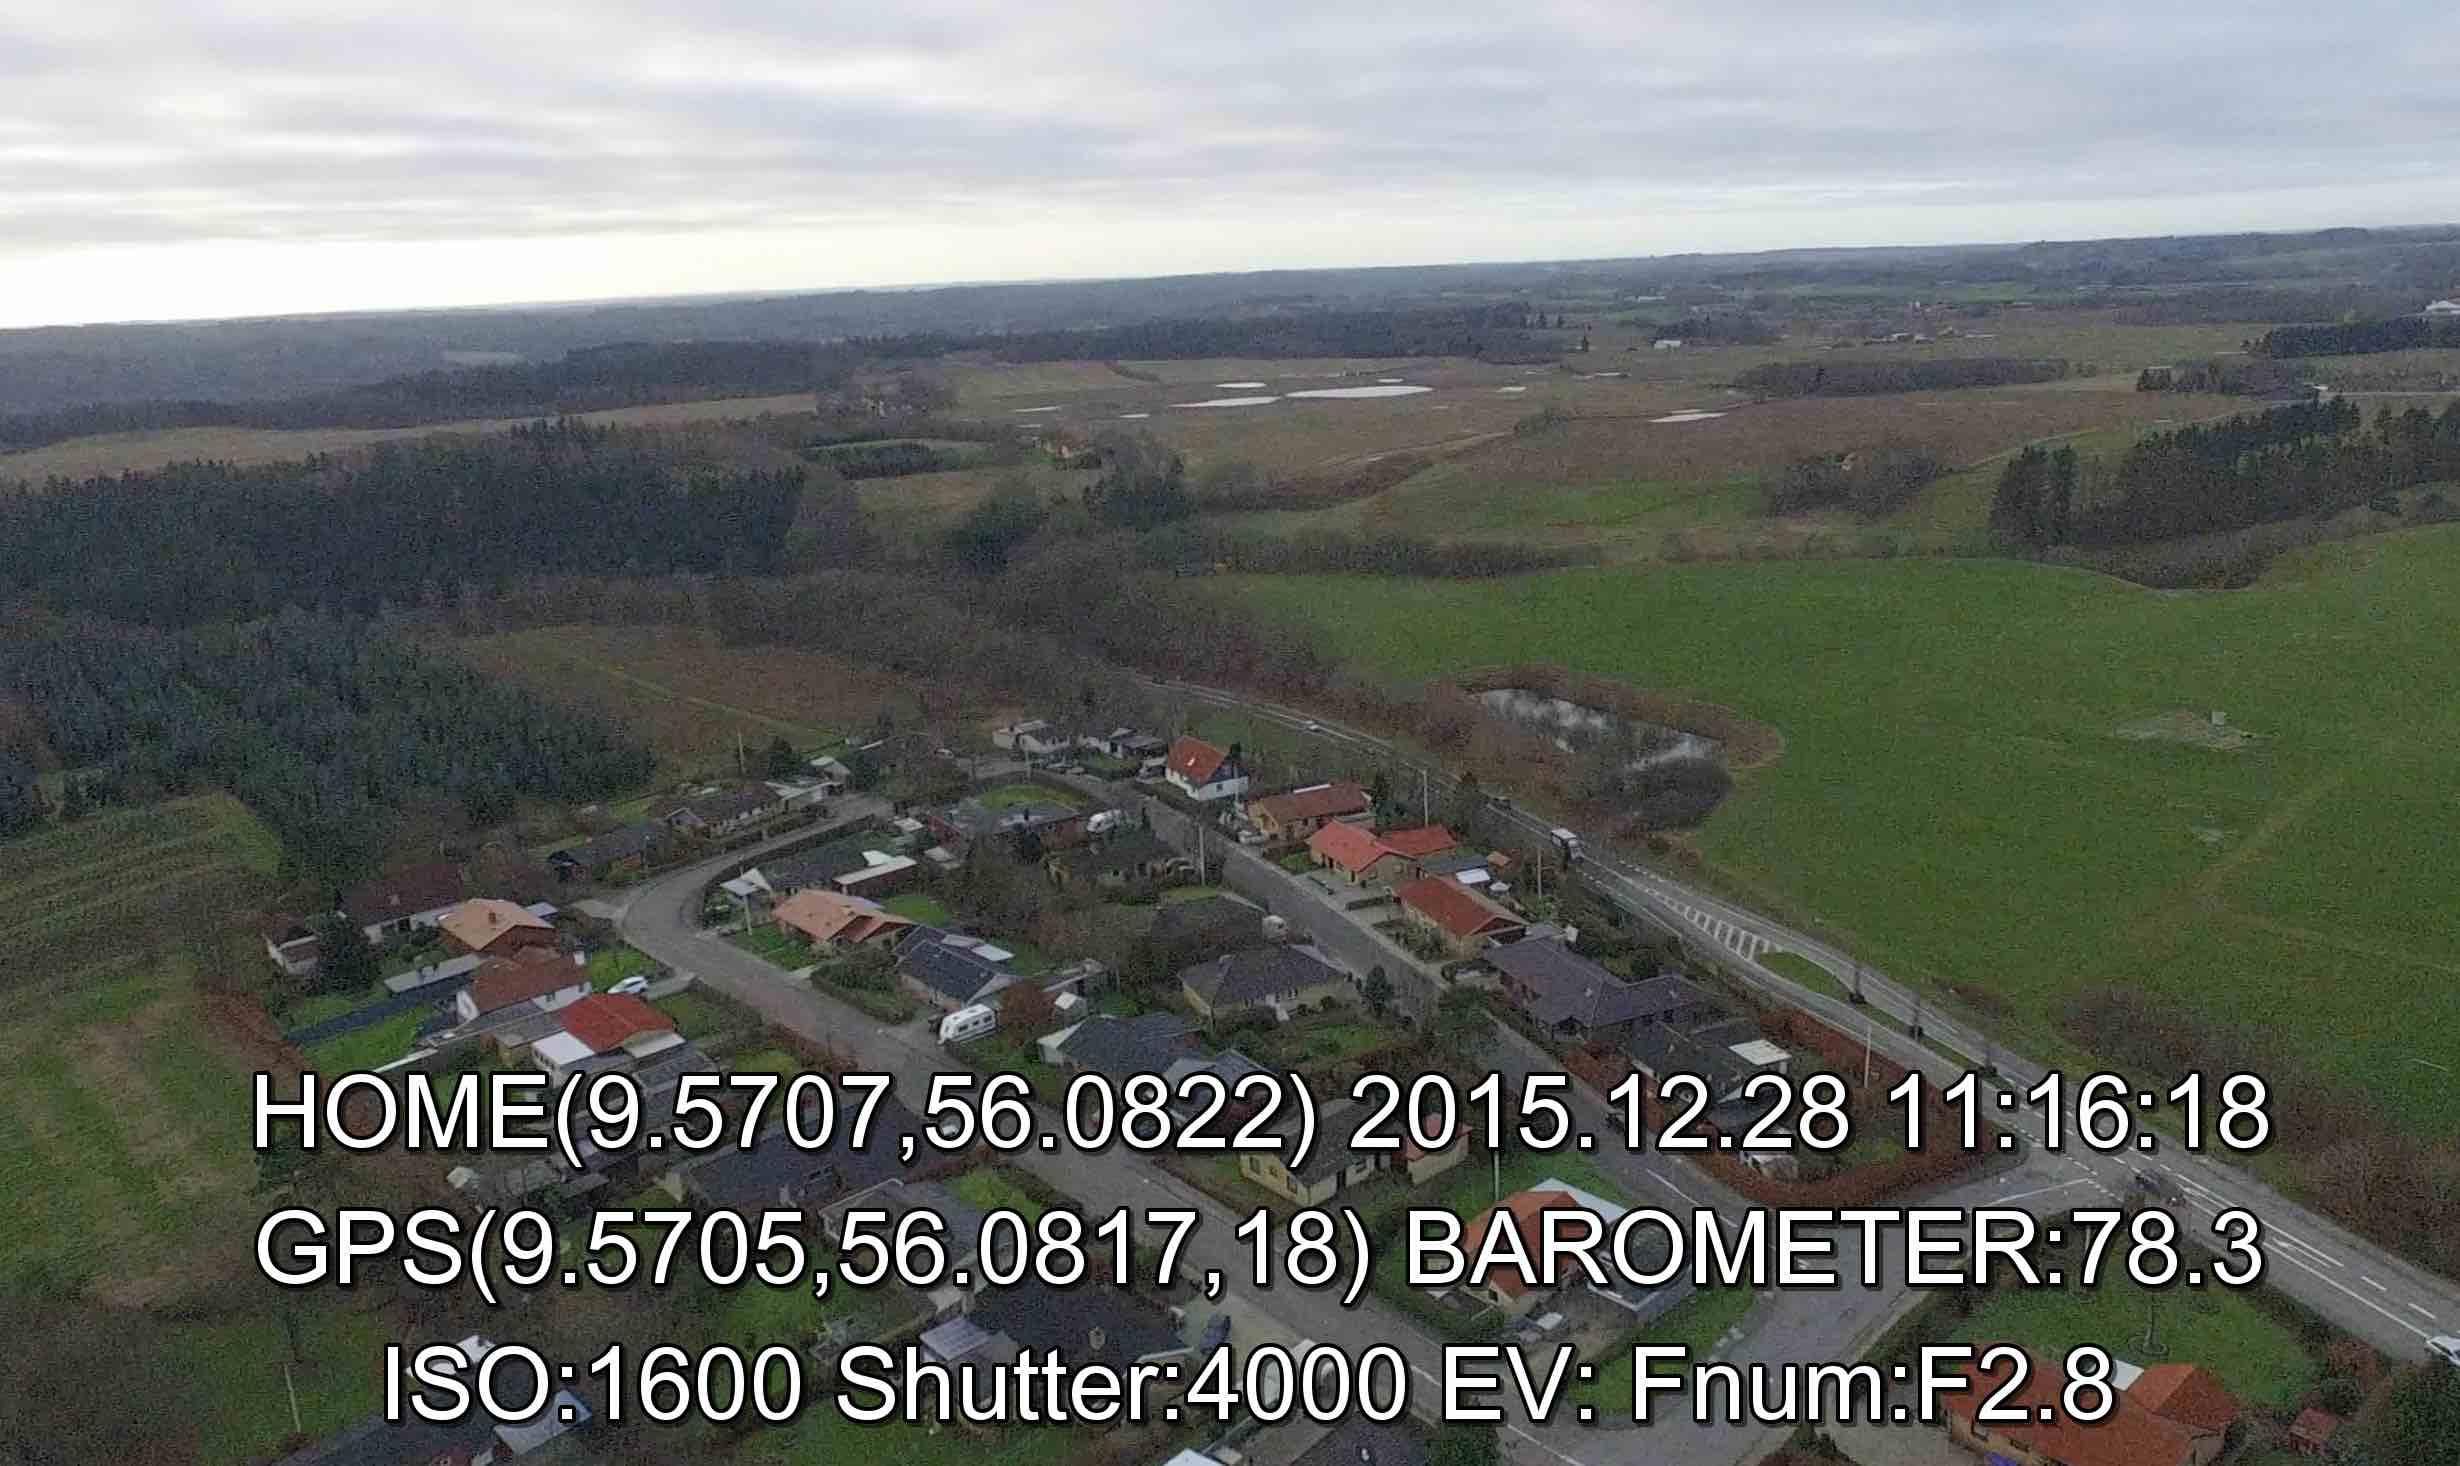 Skærmbillede 2015-12-28 kl. 16.13.24.jpg